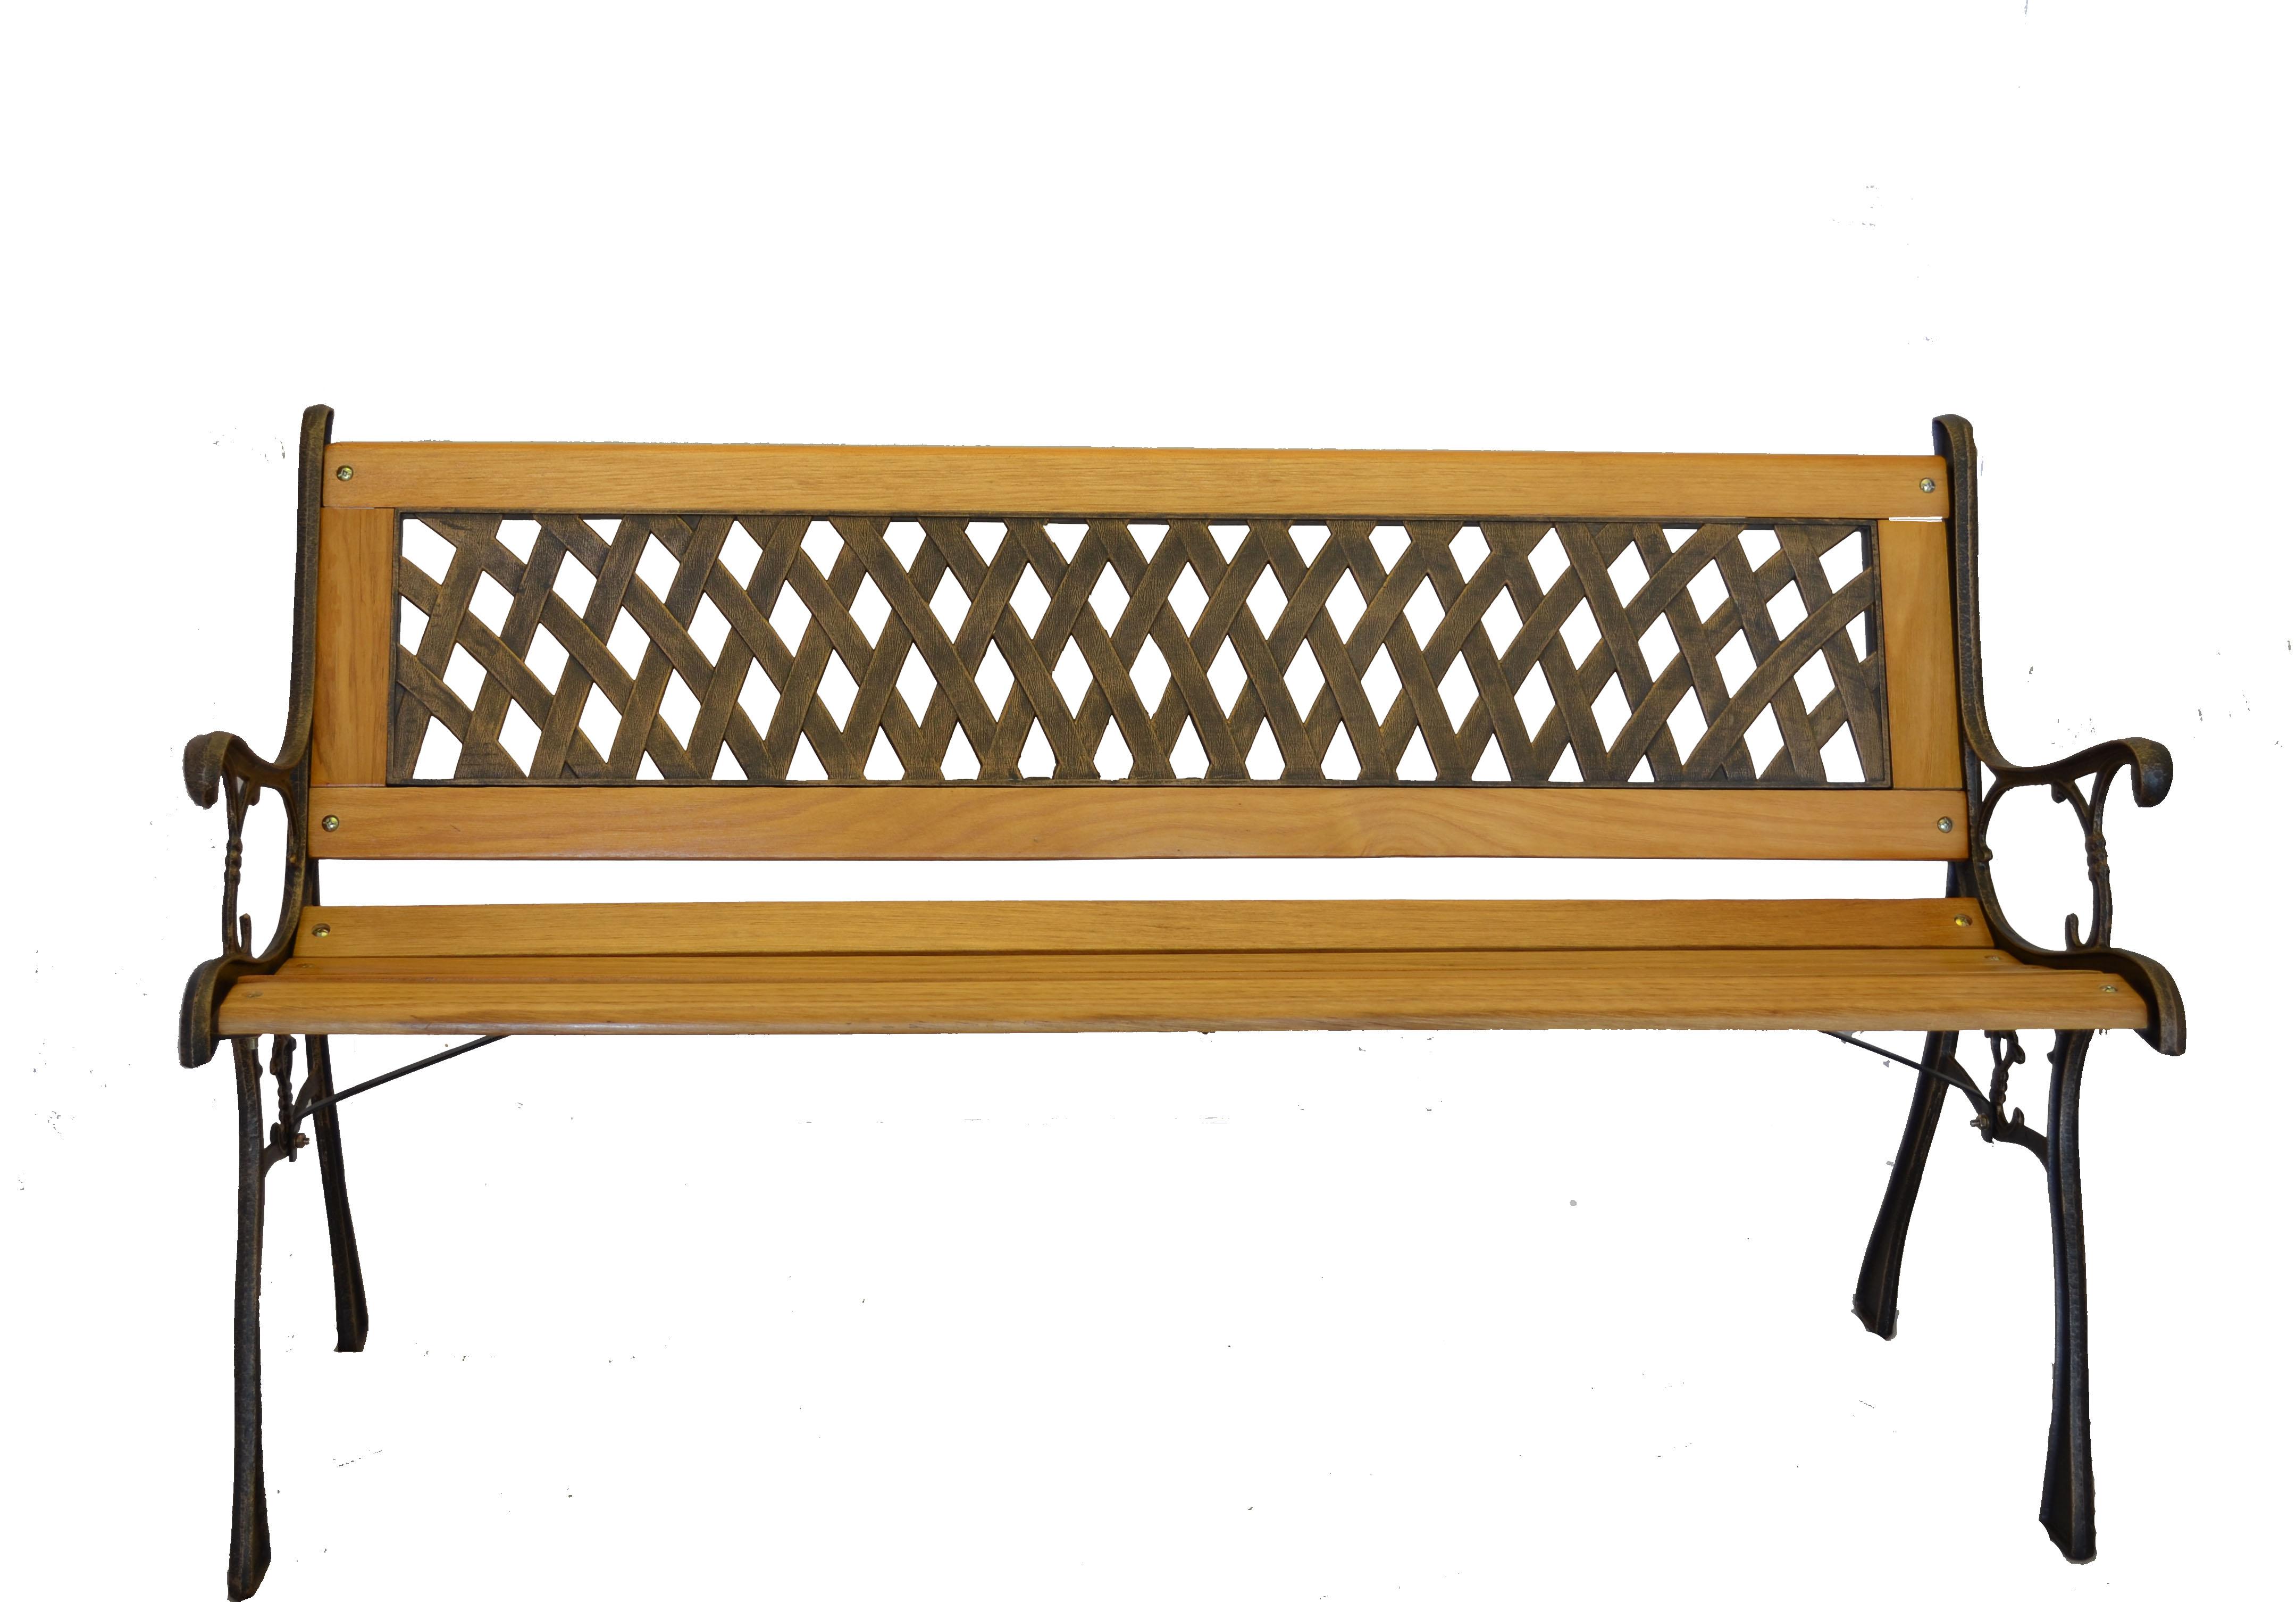 Basket Weave Iron & Wooden Park Bench w  Resin Back Insert for Yard or Garden V2 by Kozy Life